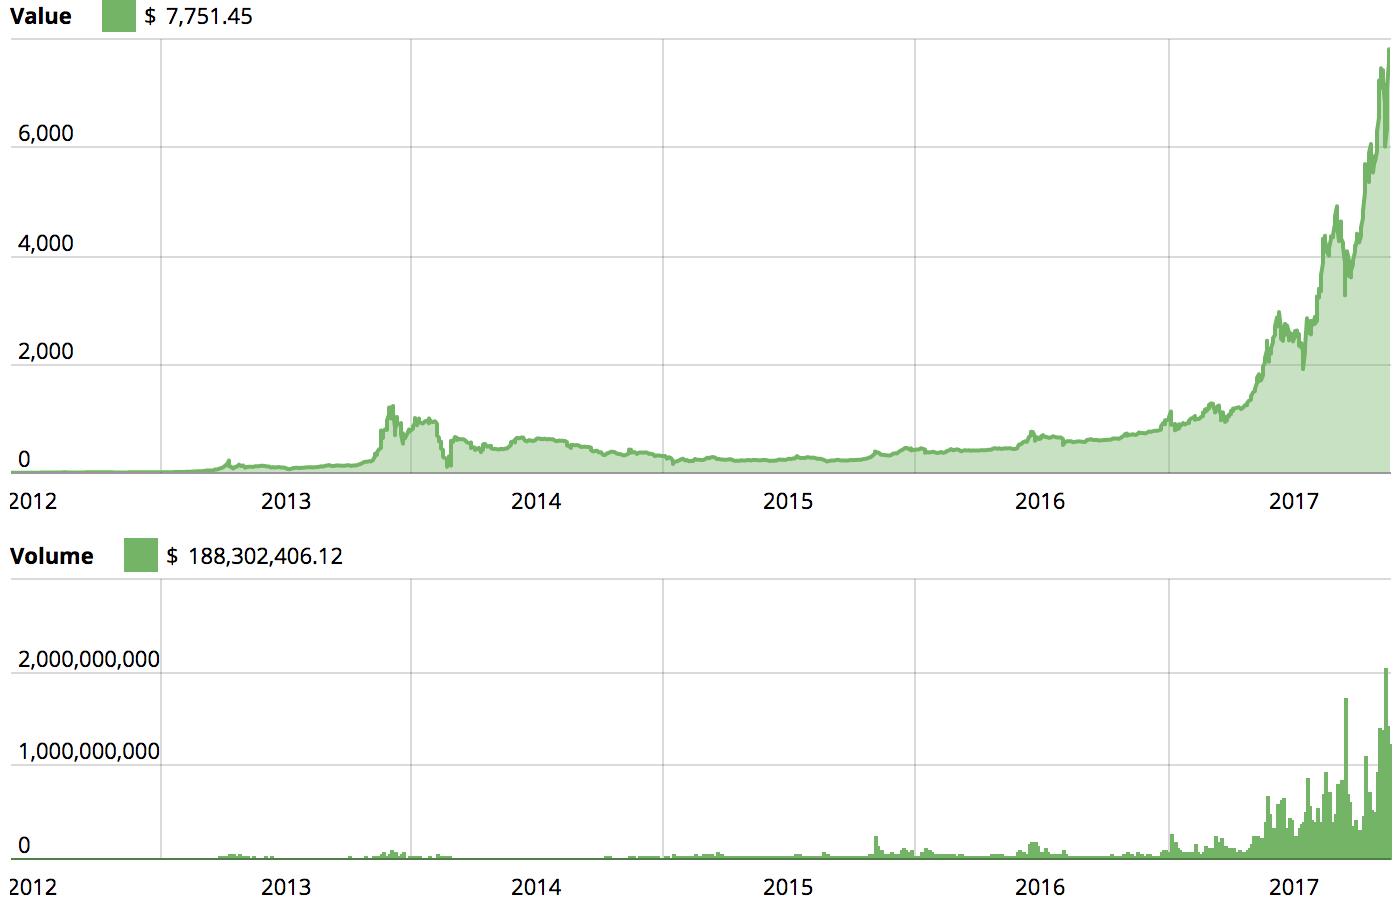 Cexio halts cloud mining service due to low bitcoin price